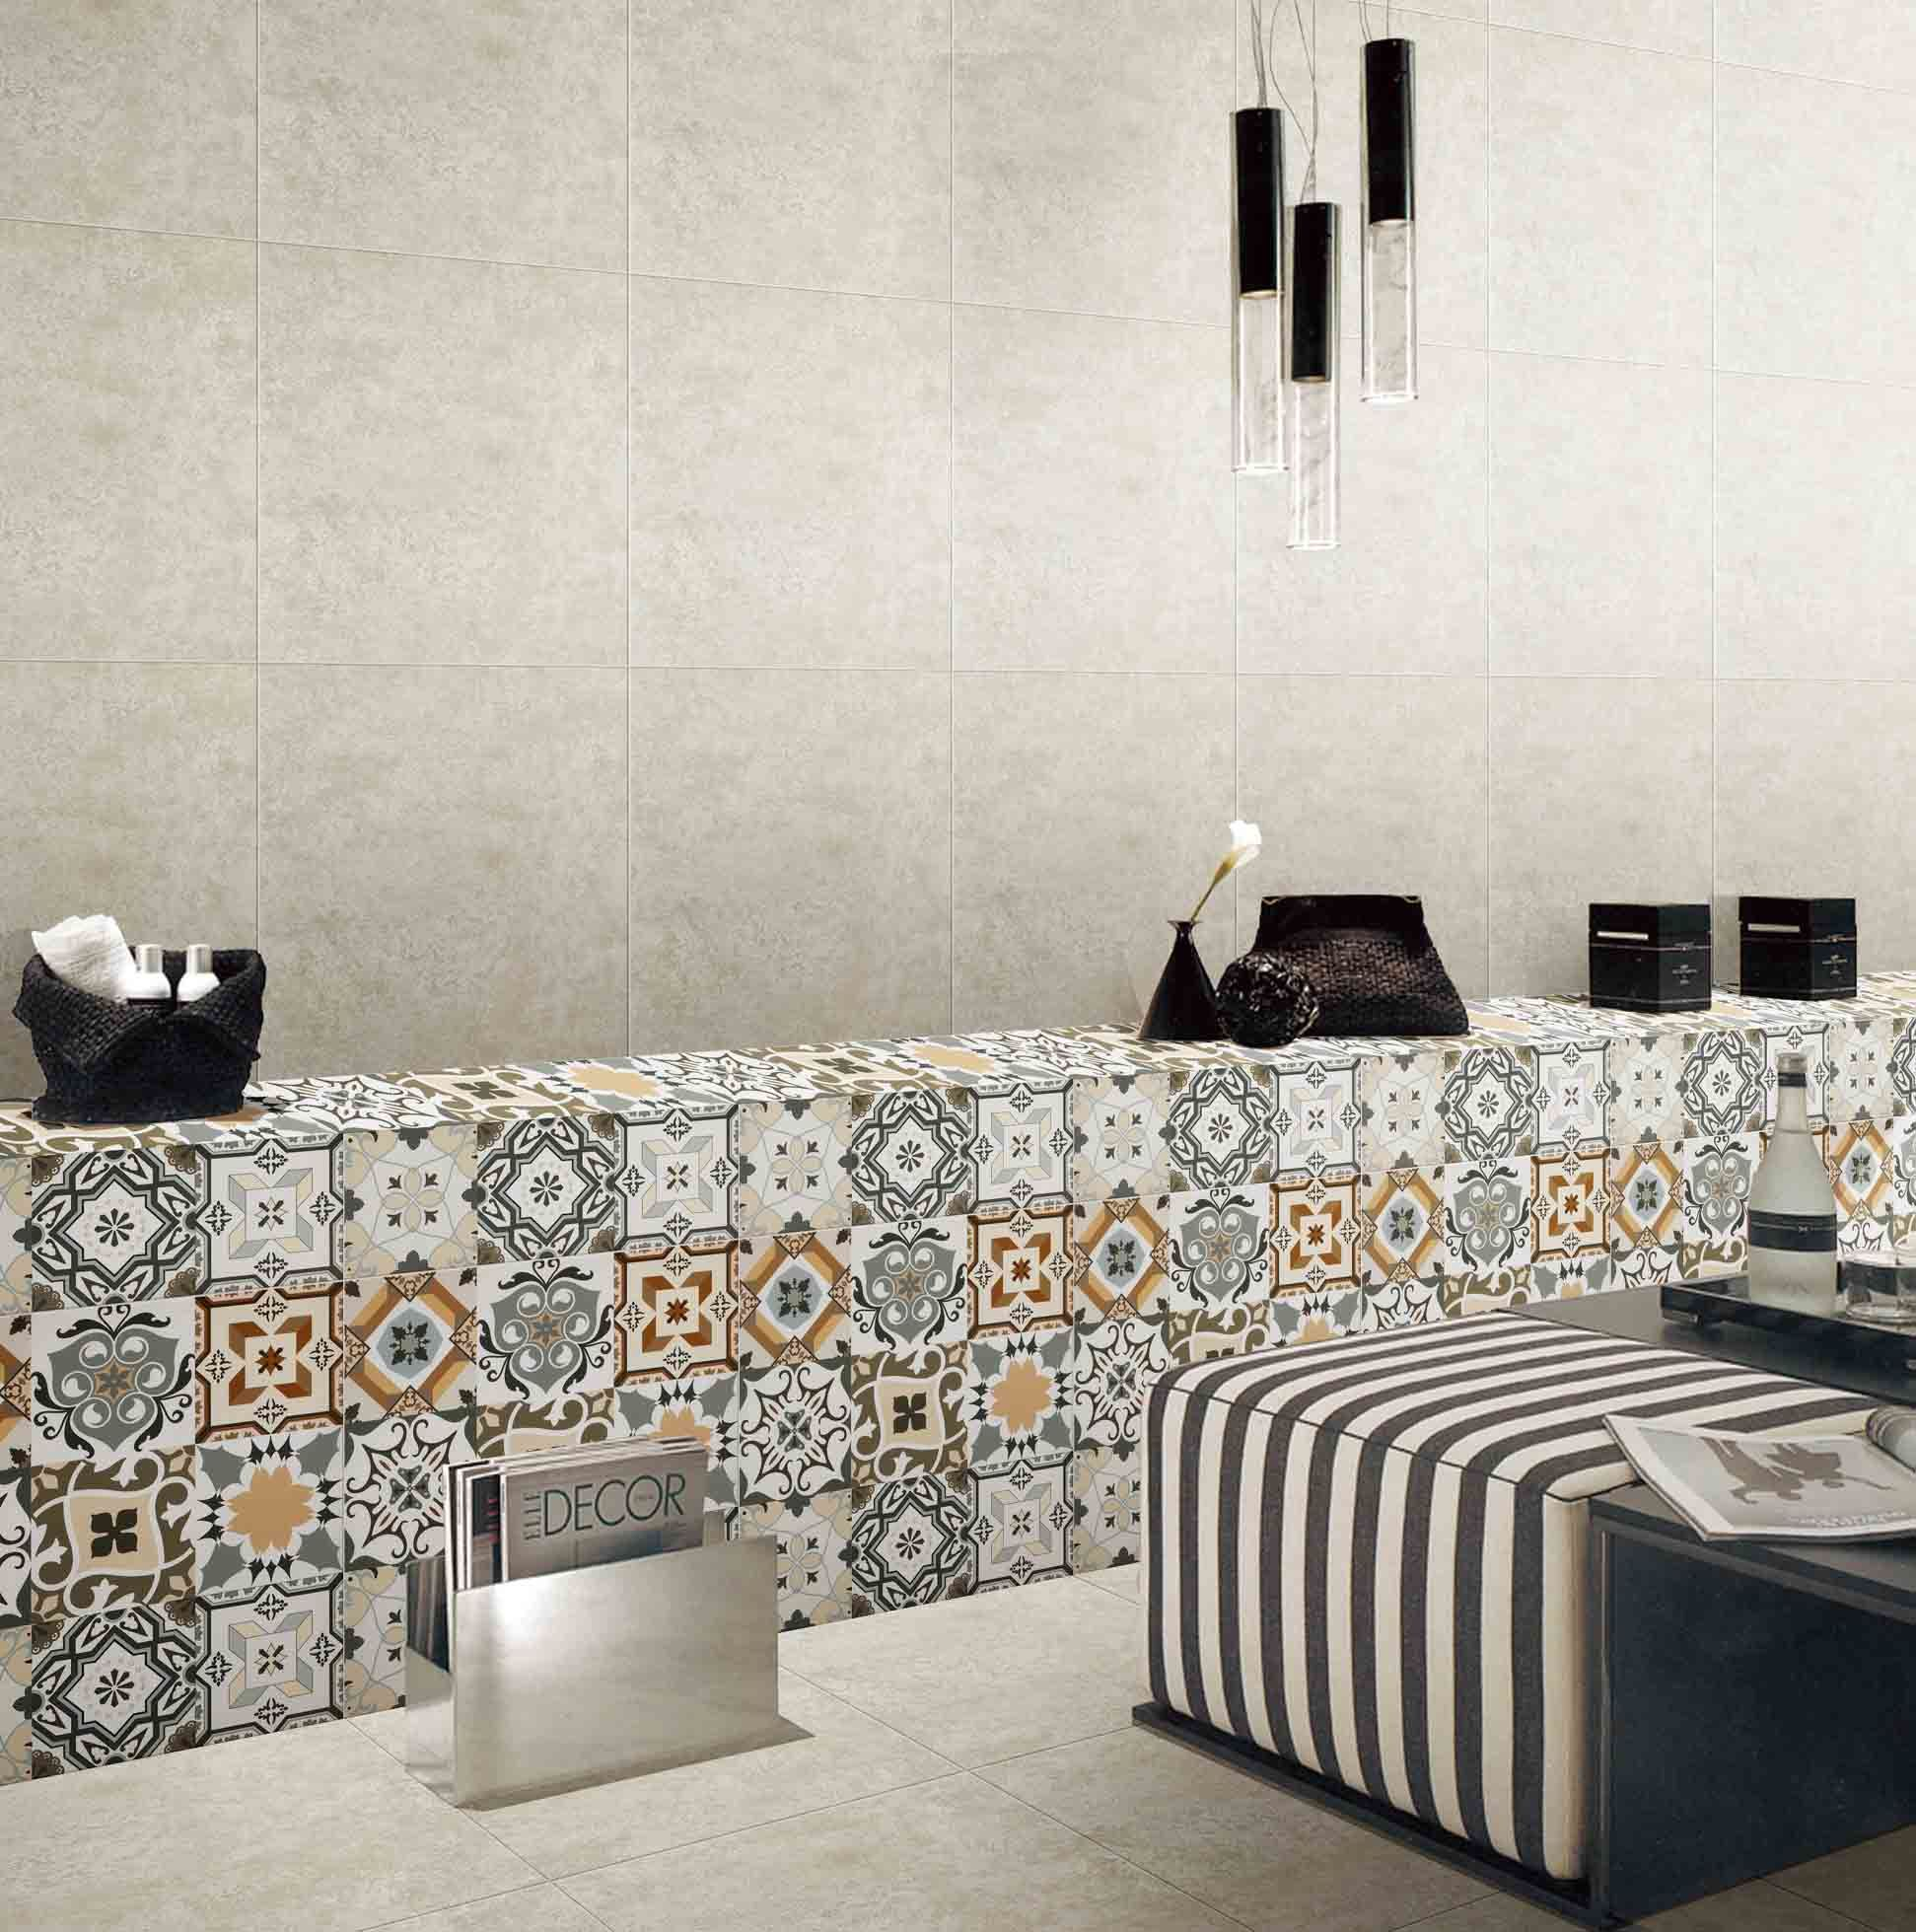 Spain ceramic tiles images tile flooring design ideas ceramic tiles made in spain choice image tile flooring design ideas spain ceramic tiles company gallery doublecrazyfo Choice Image